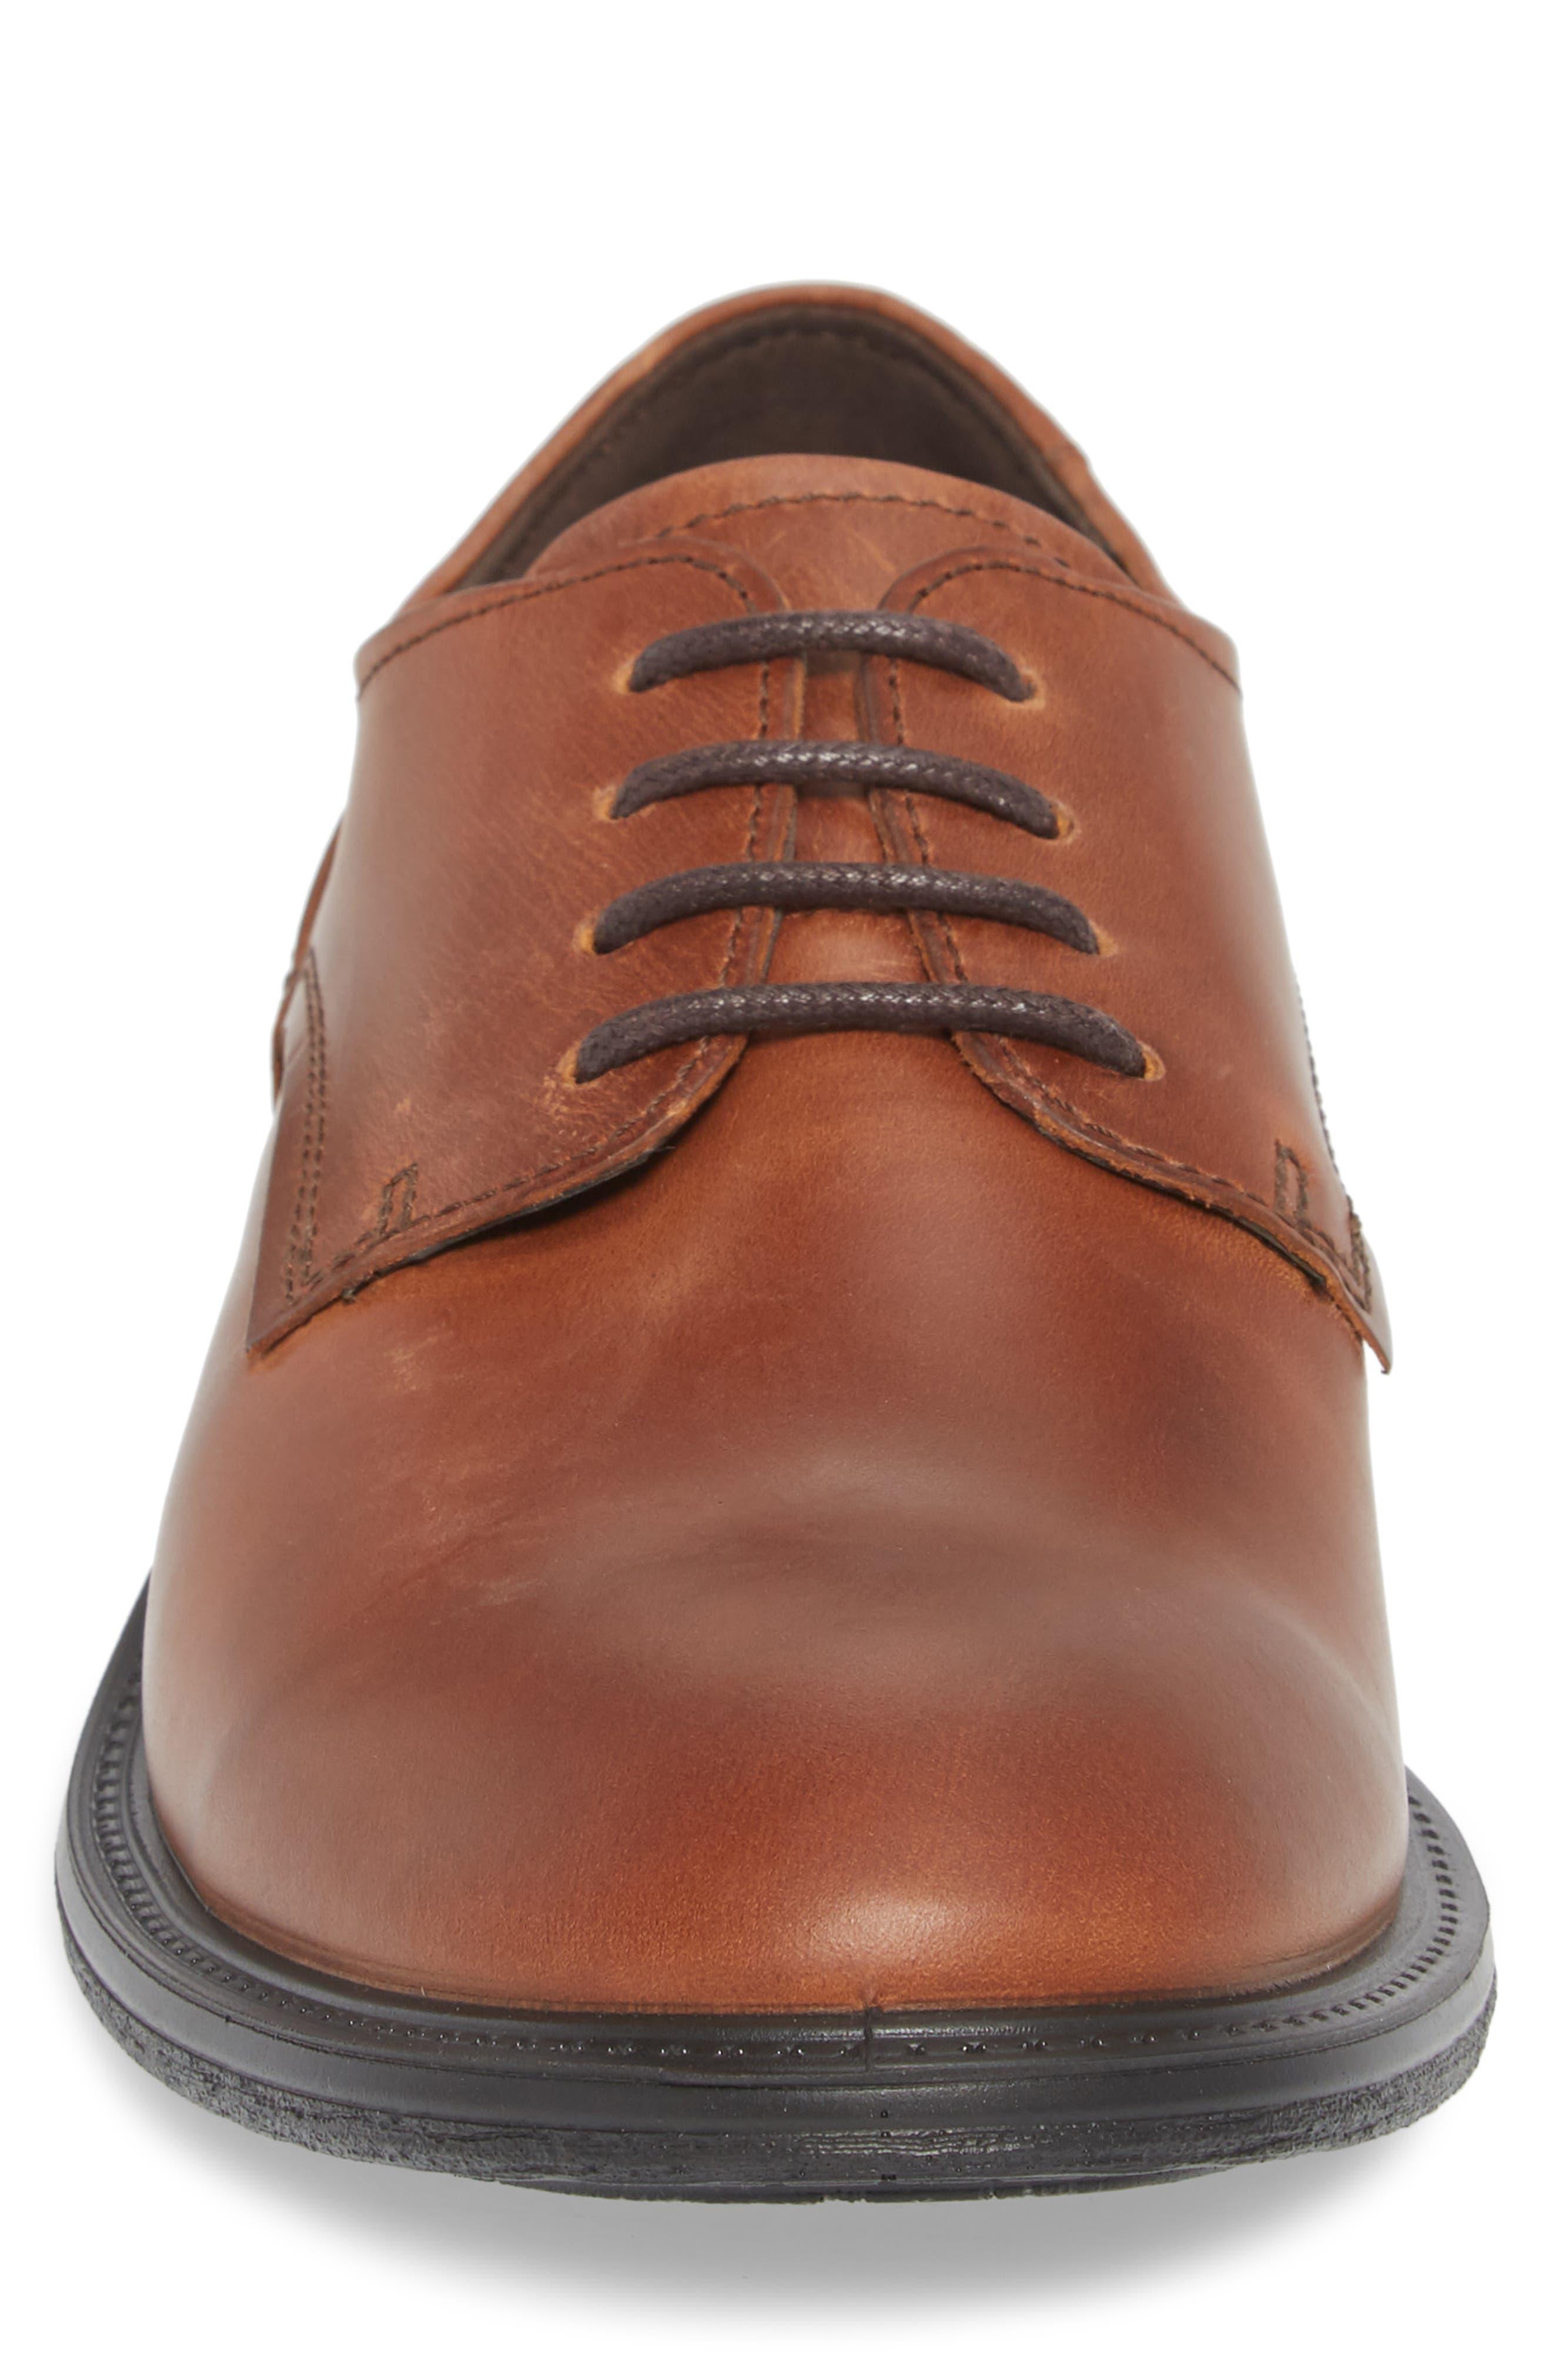 Knoxville Moonless AZT Derby,                             Alternate thumbnail 4, color,                             Cognac Leather